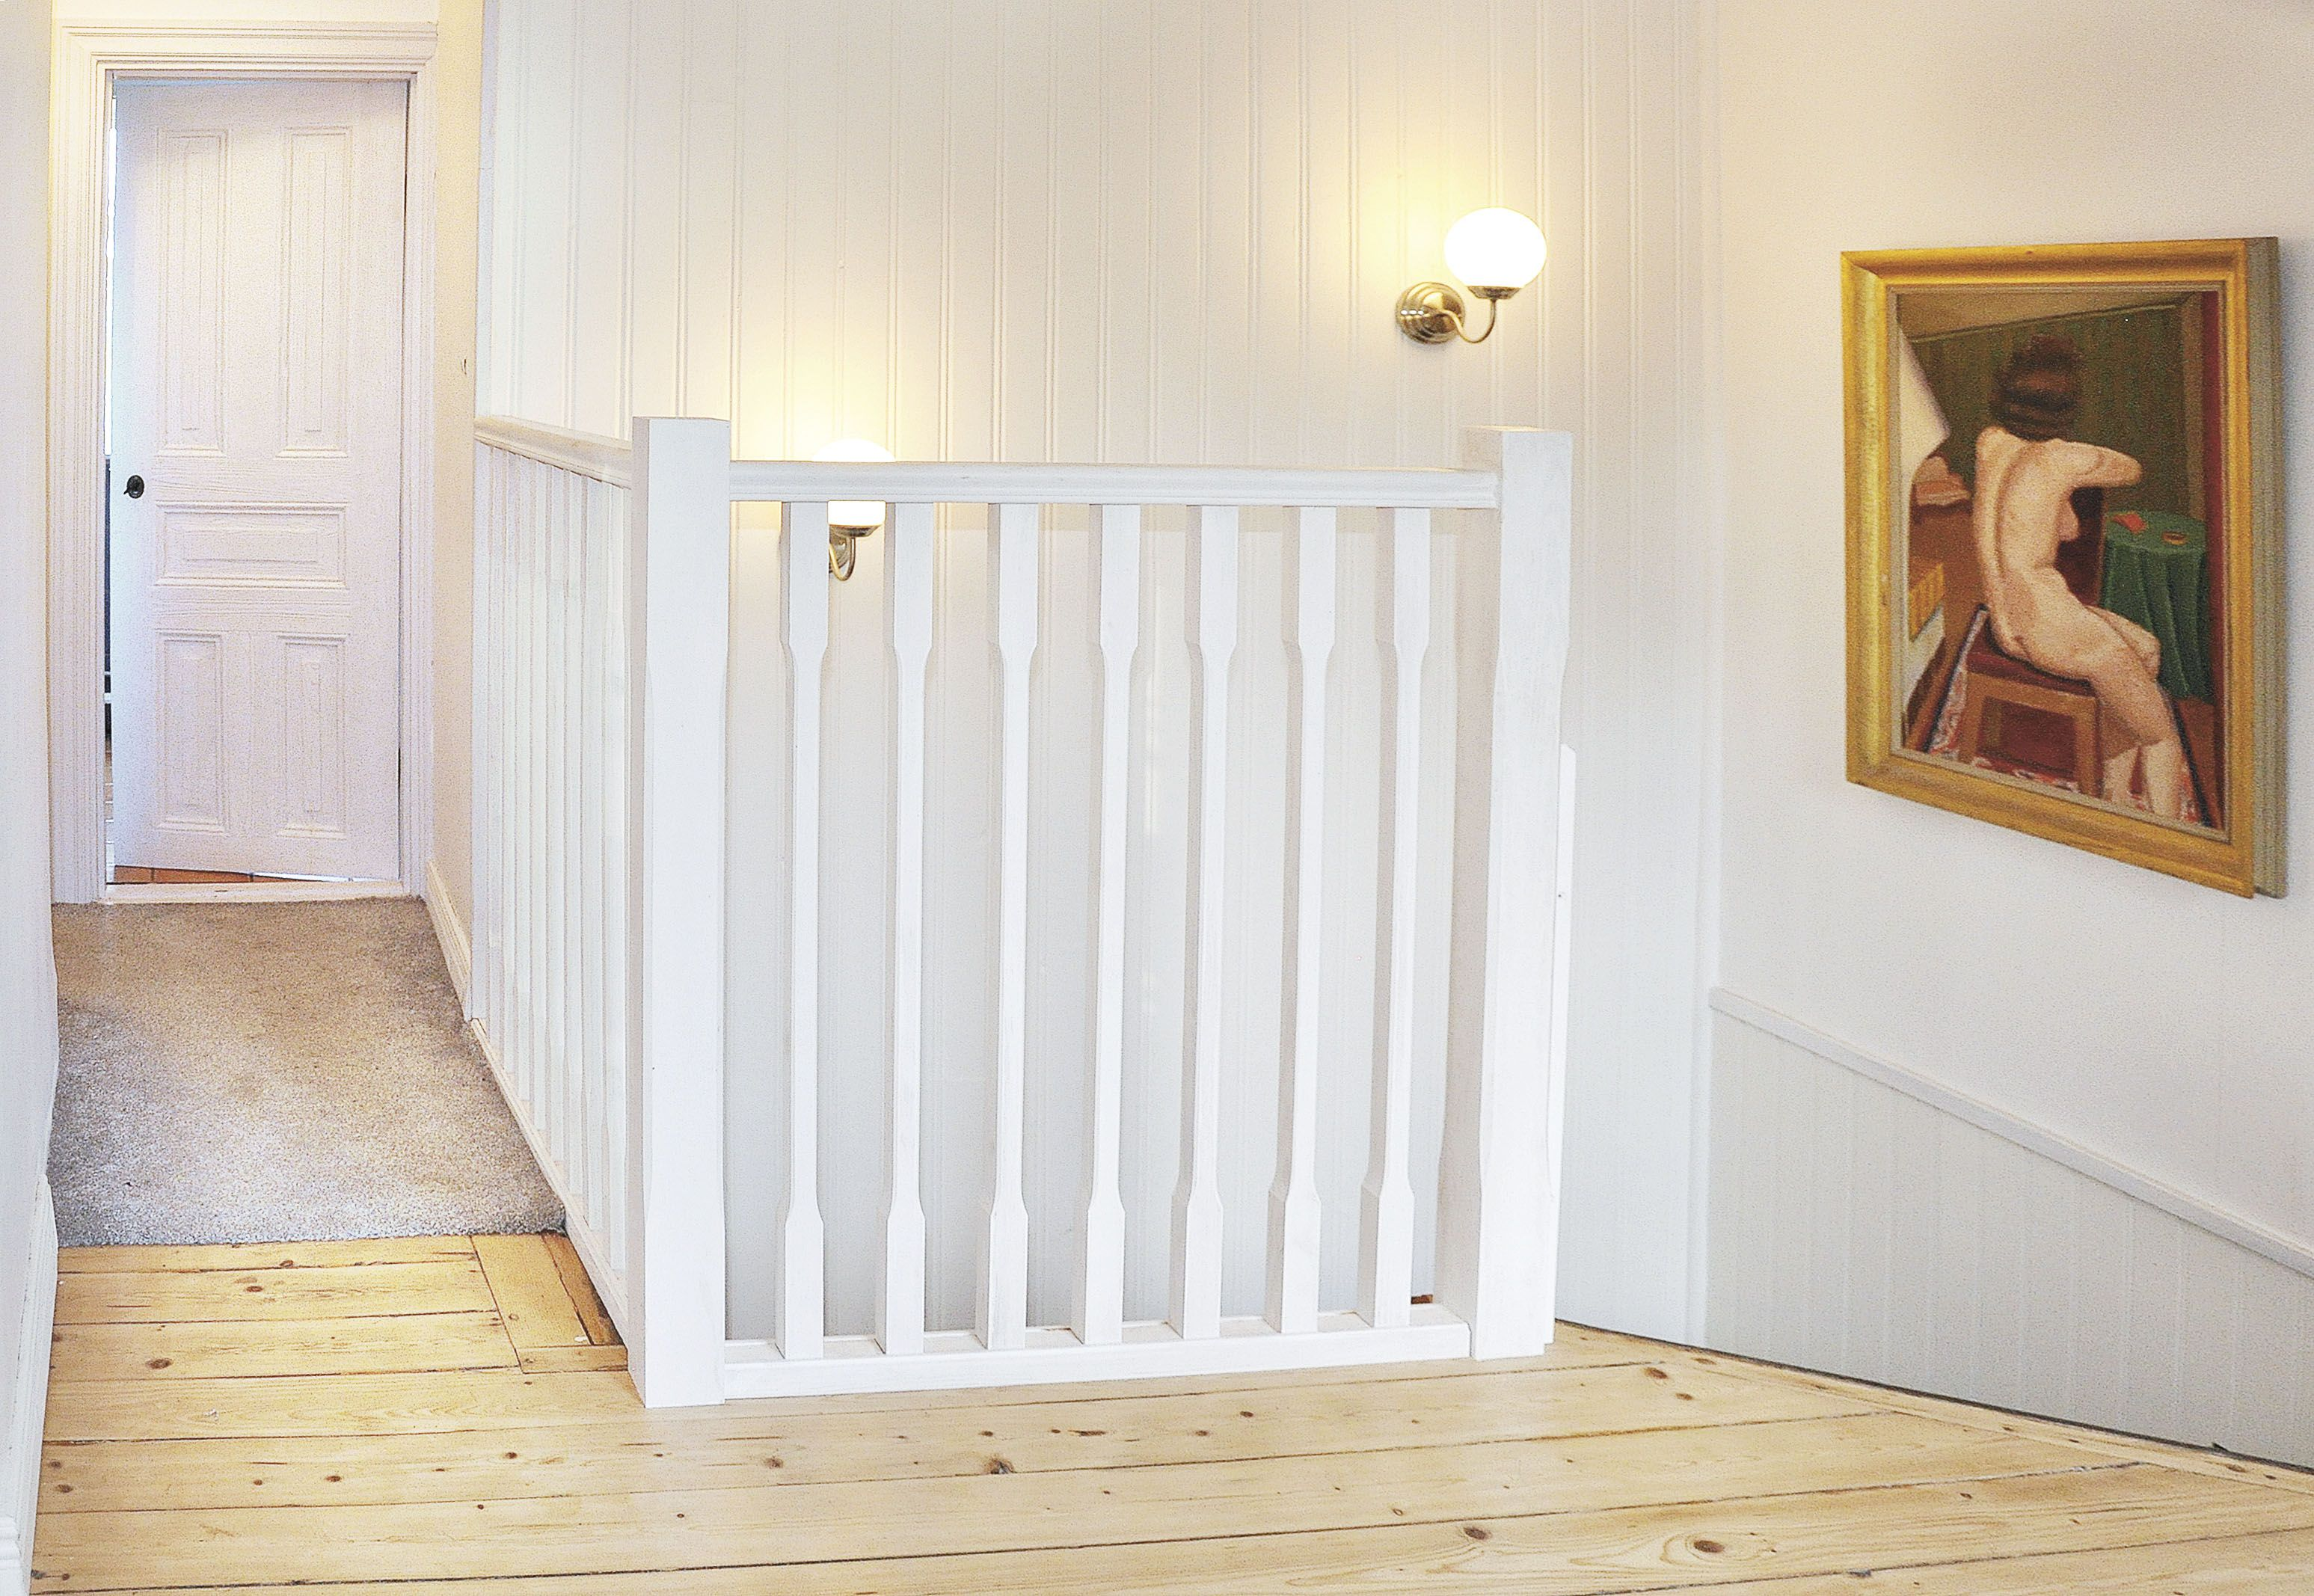 Käsipuu Helsinki valge, 45 x 70 x 2300 mm